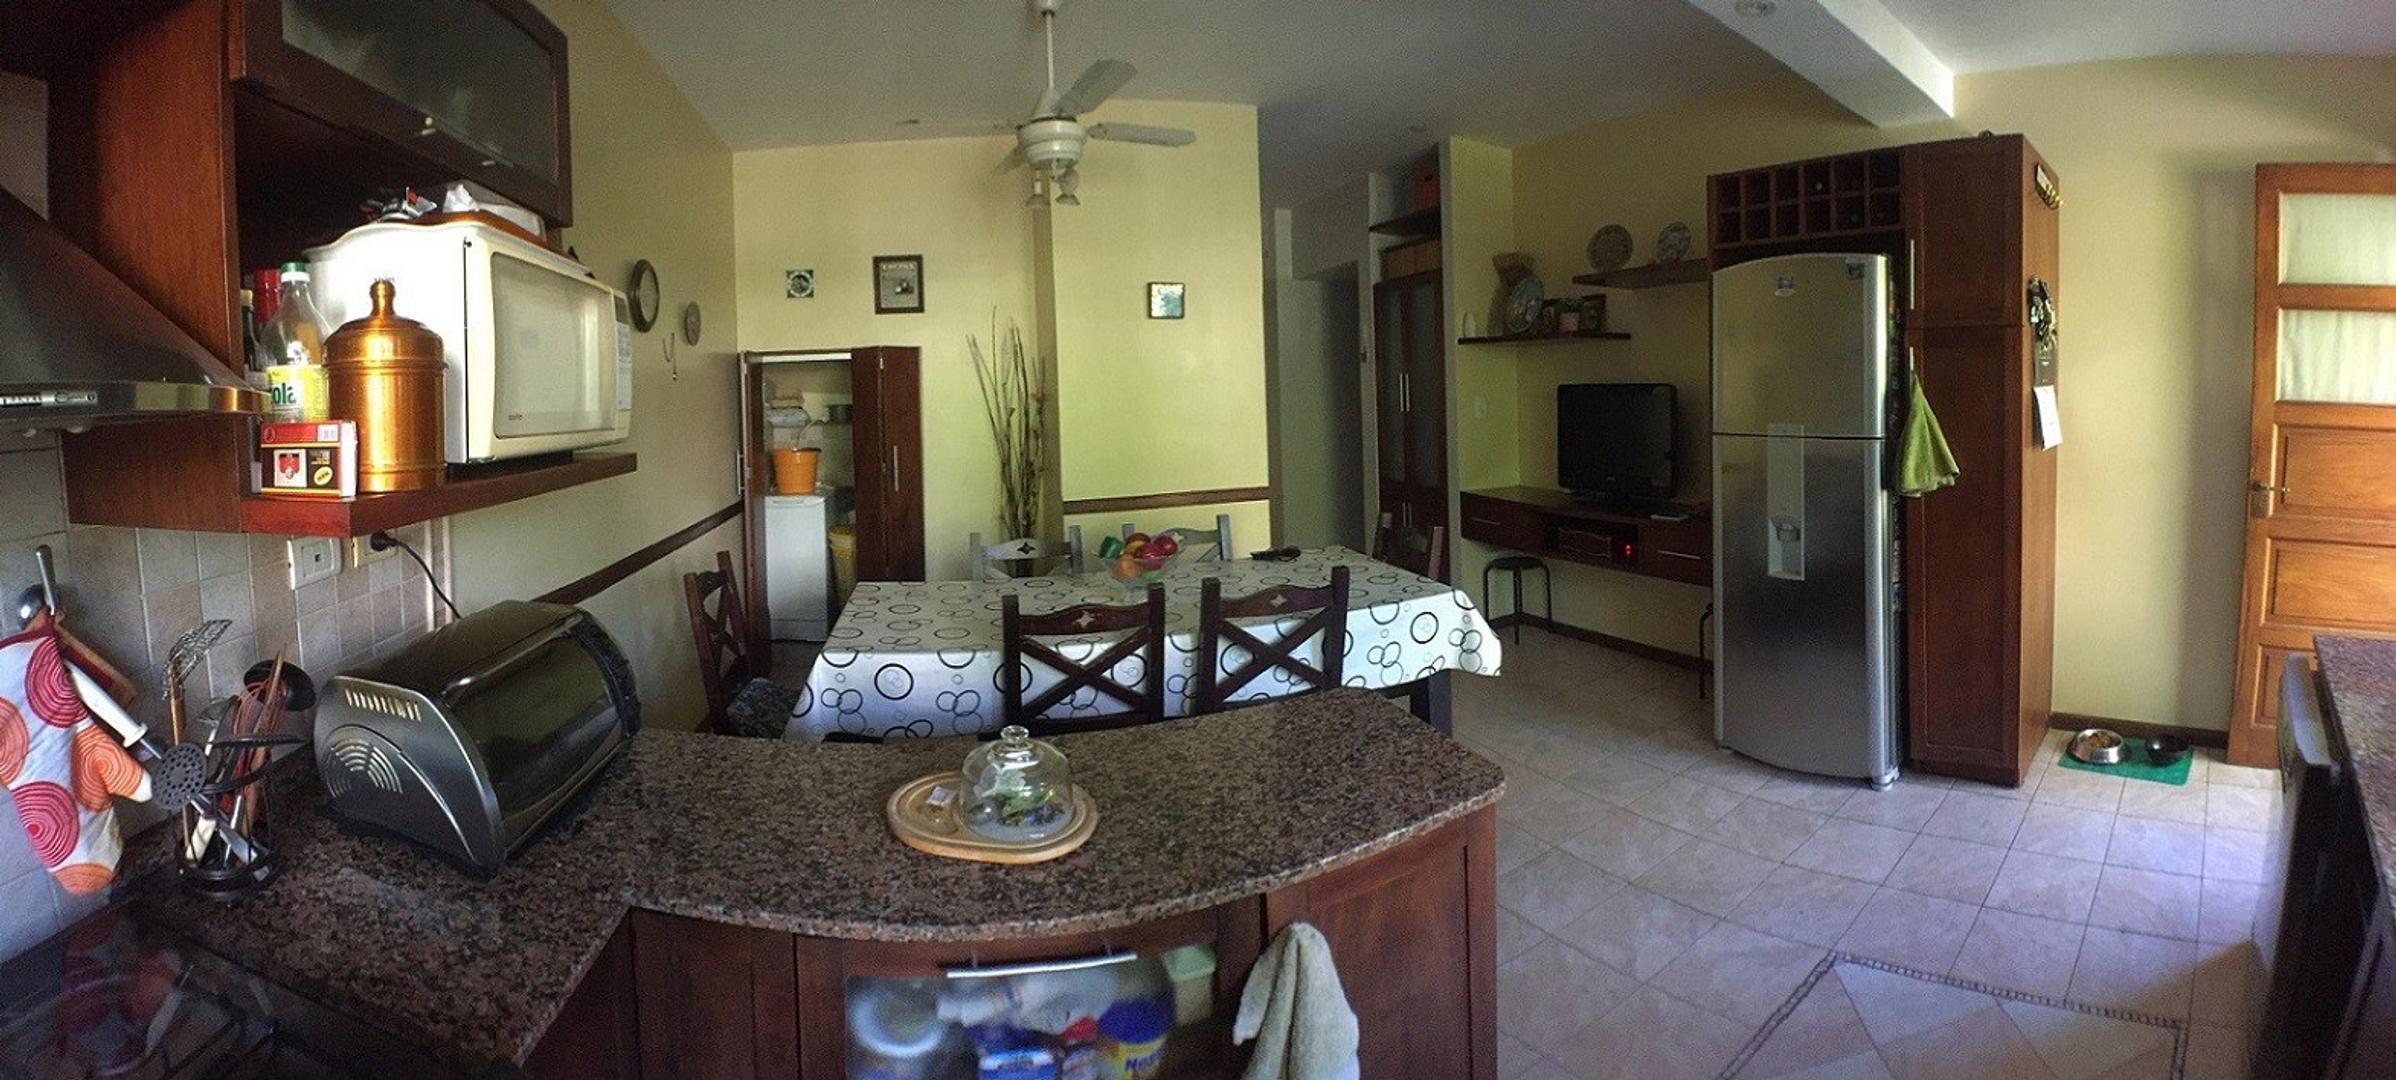 Casa - Venta - Argentina, FLORIDA - D.F. Sarmiento 2900